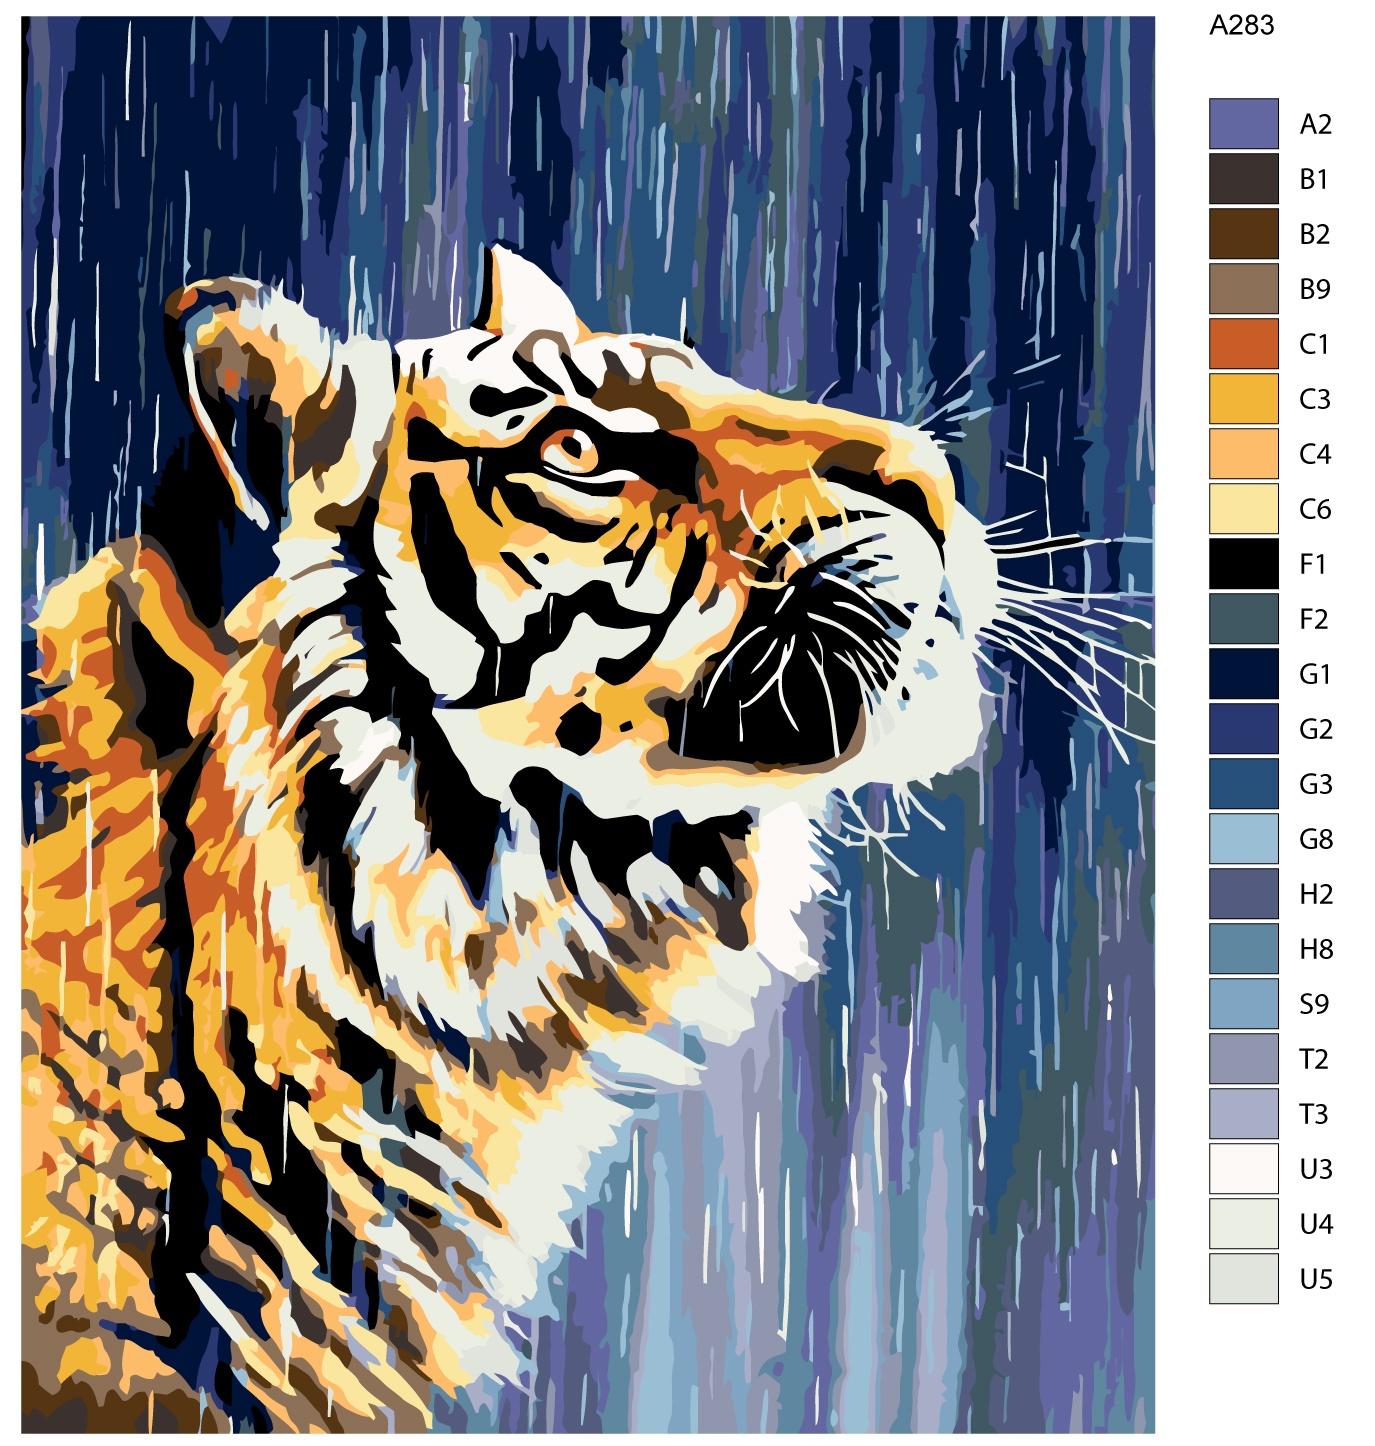 Картина по номерам, 40 x 50 см, A283